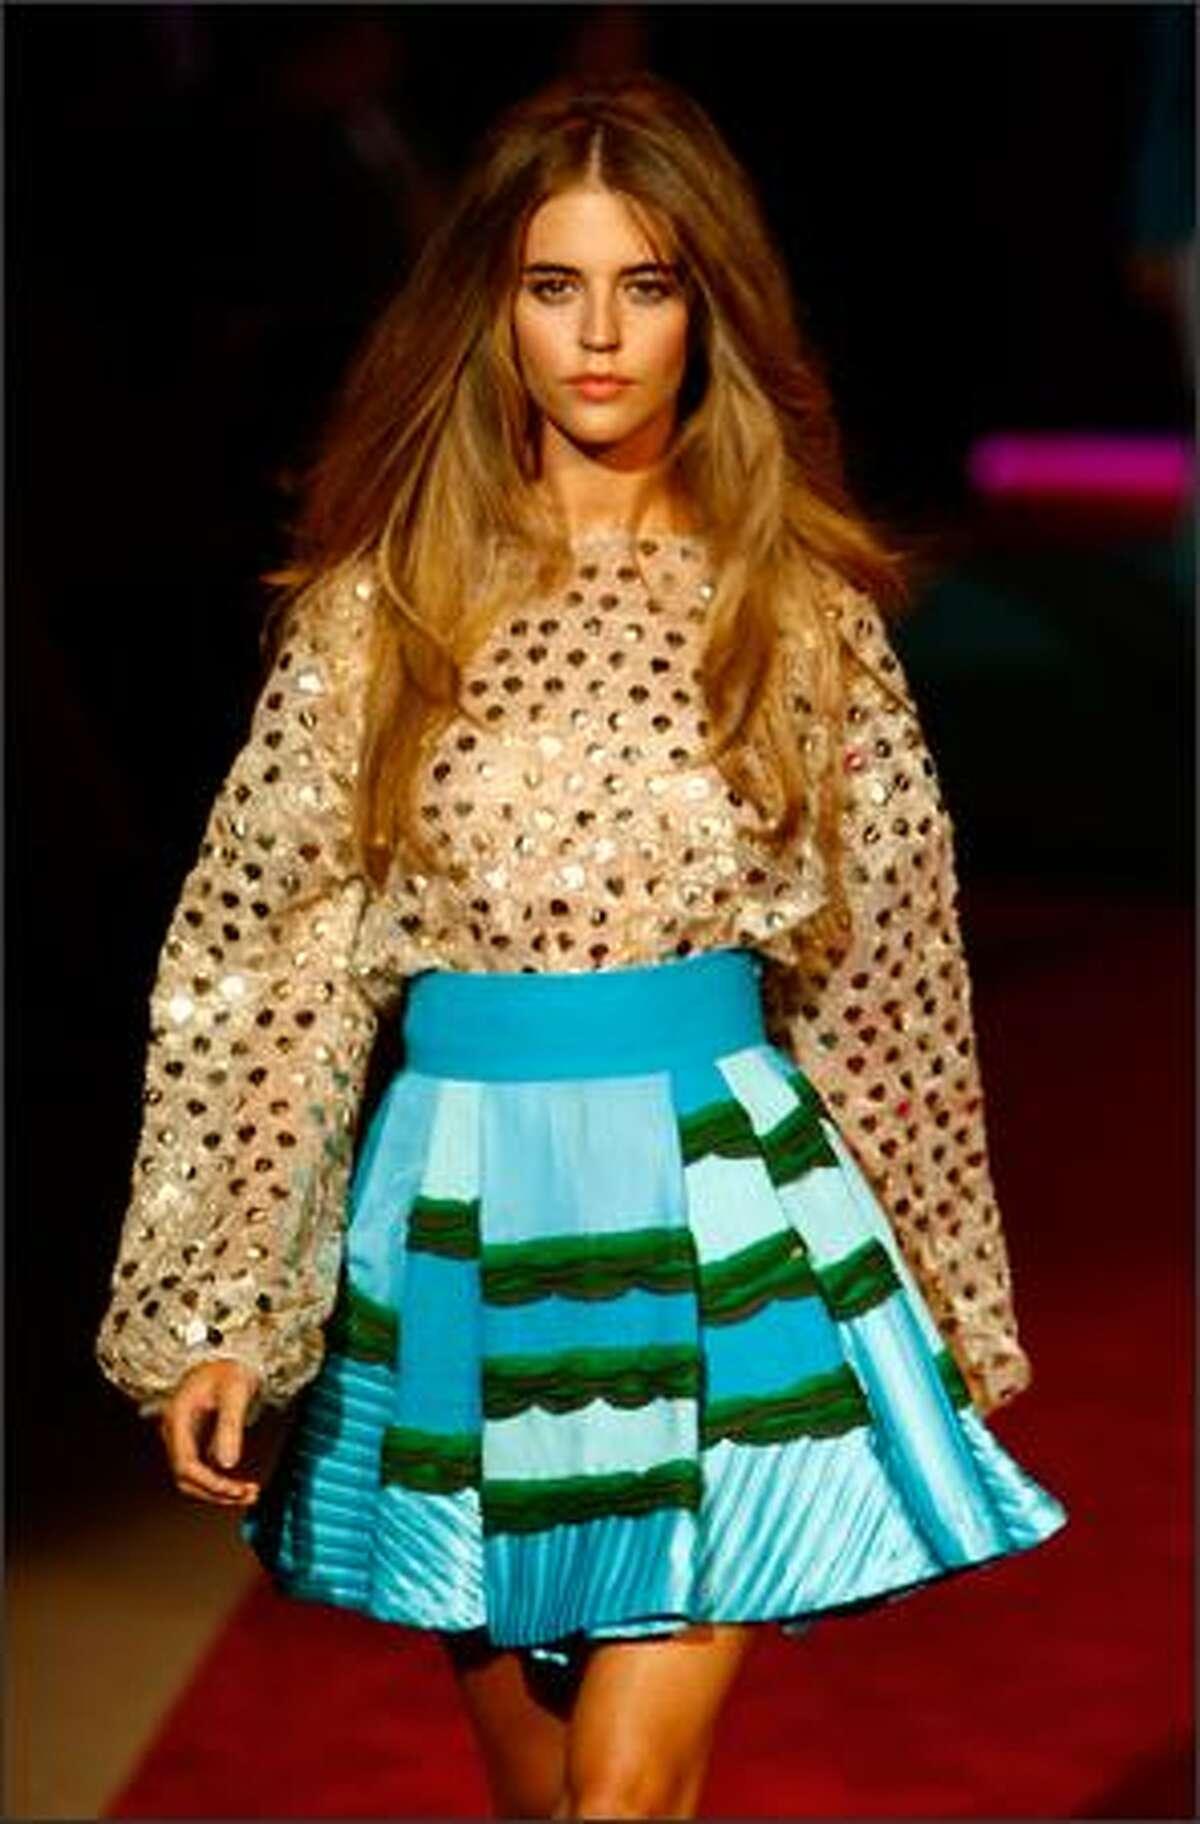 A model walks the runway at the Custo Barcelona show.